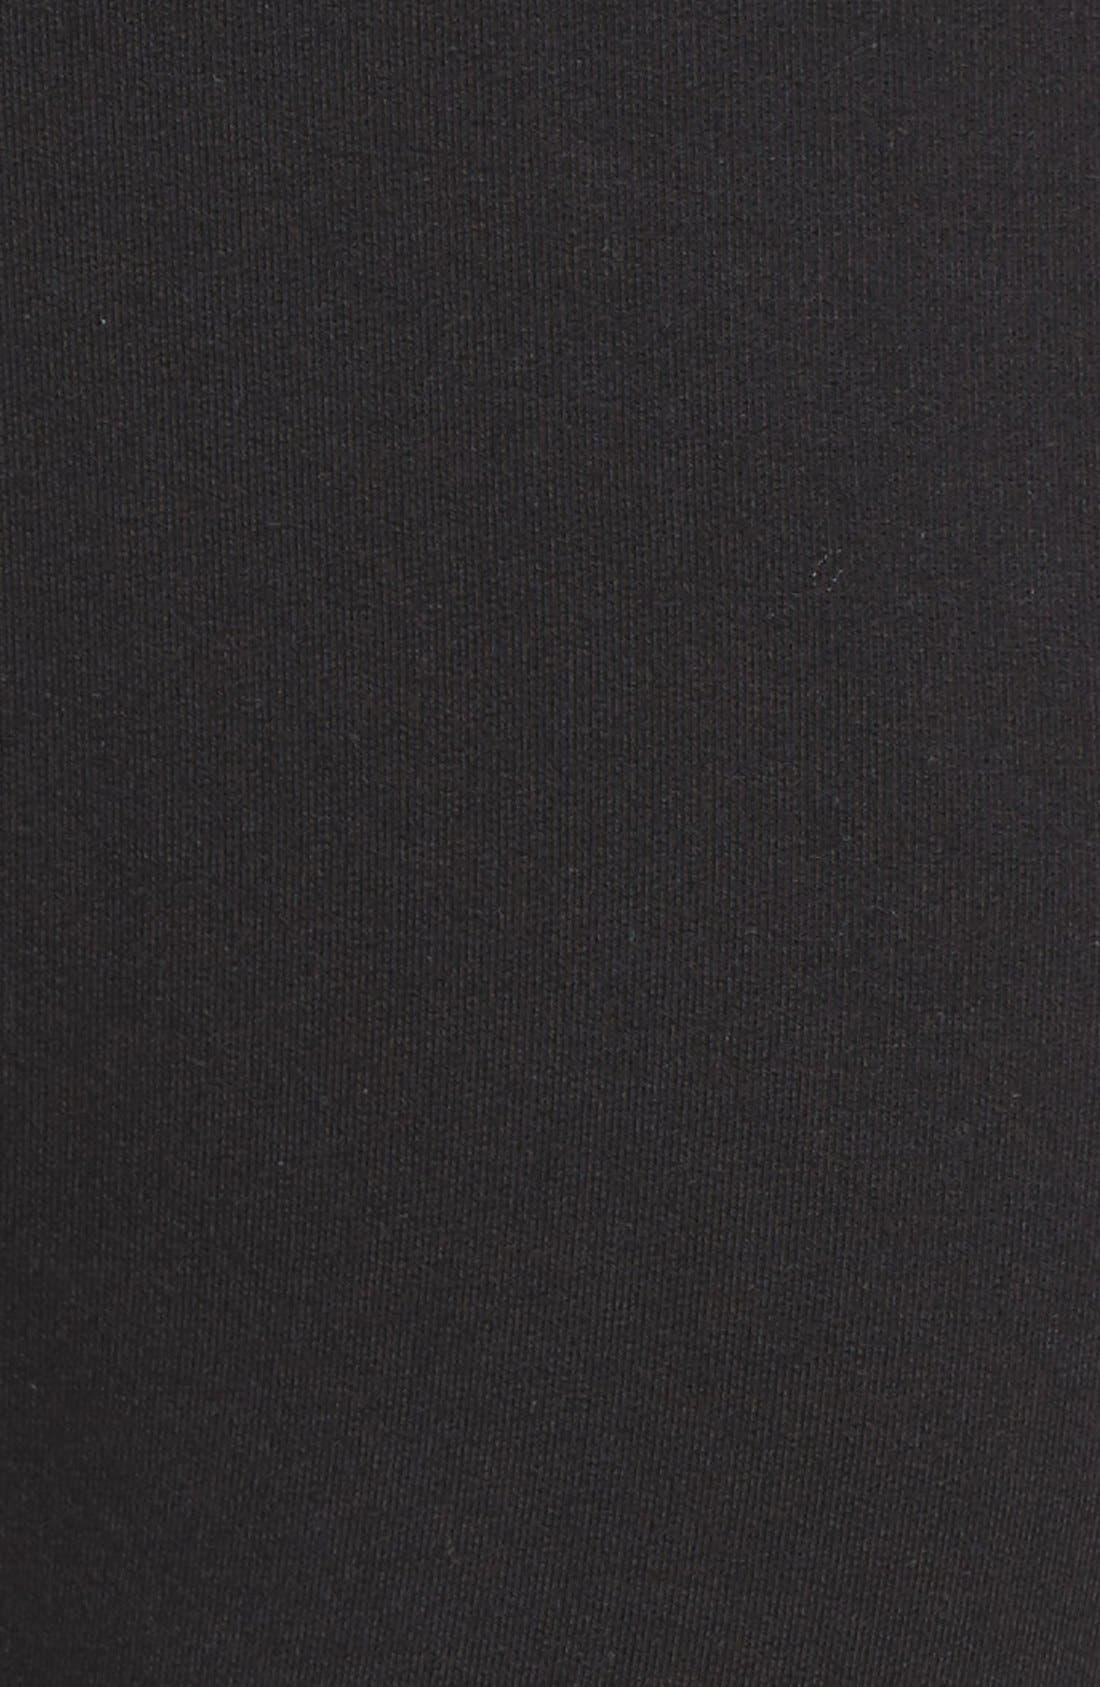 Lounge Pants,                             Alternate thumbnail 10, color,                             BLACK